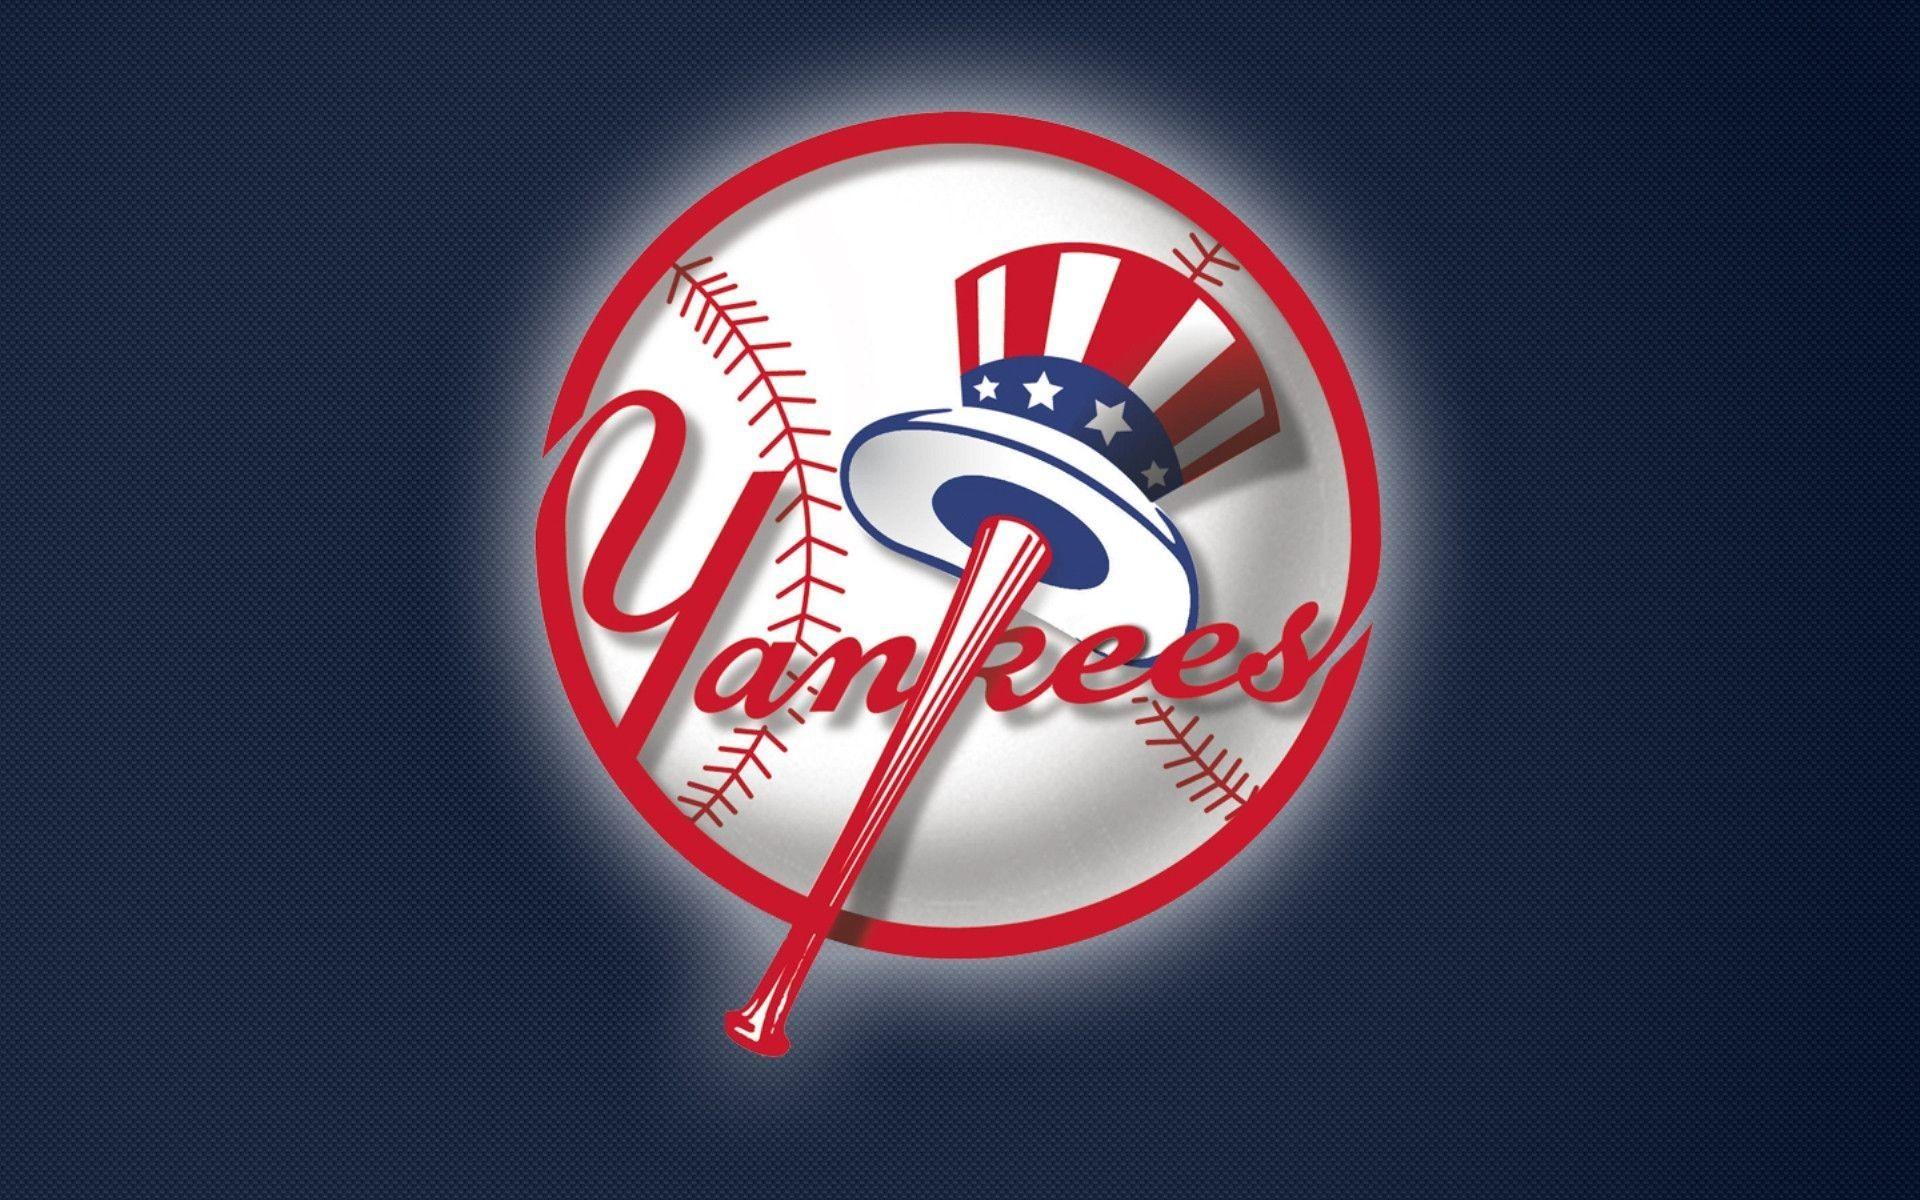 New York Yankees Wallpapers Hd Pixelstalk Net